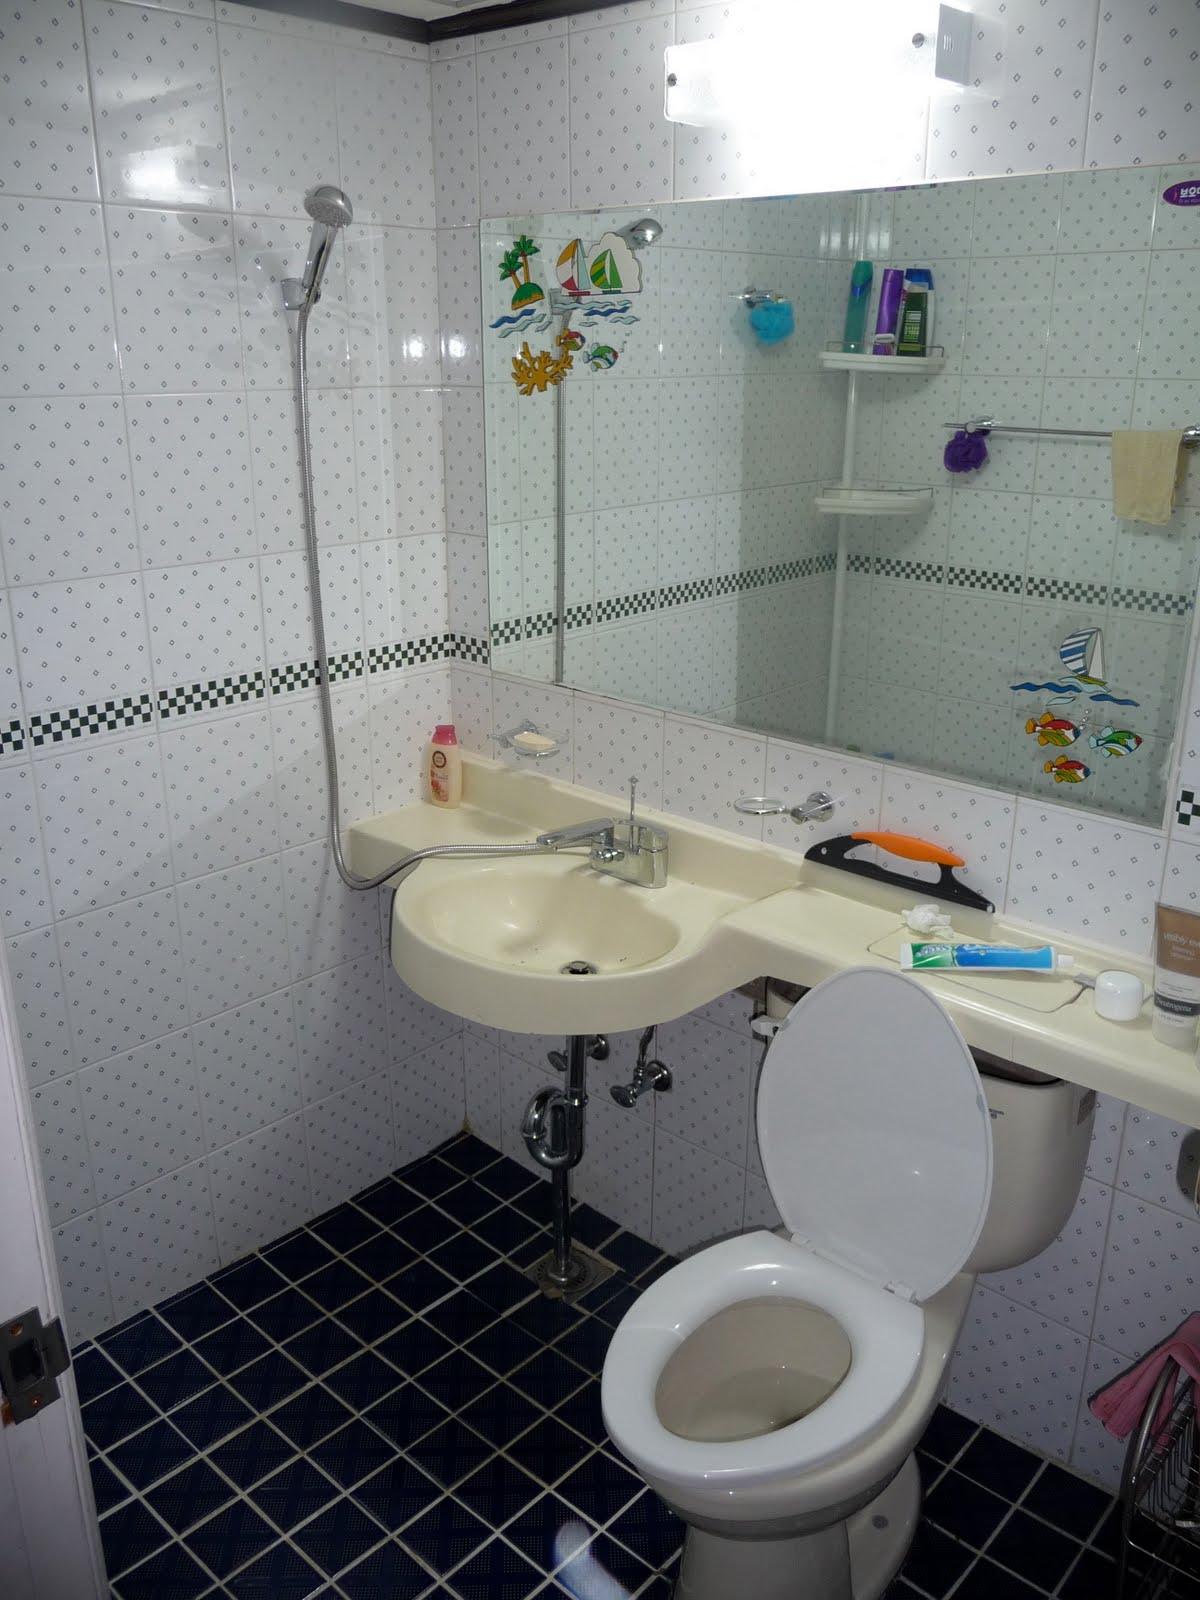 Boys bathrooms